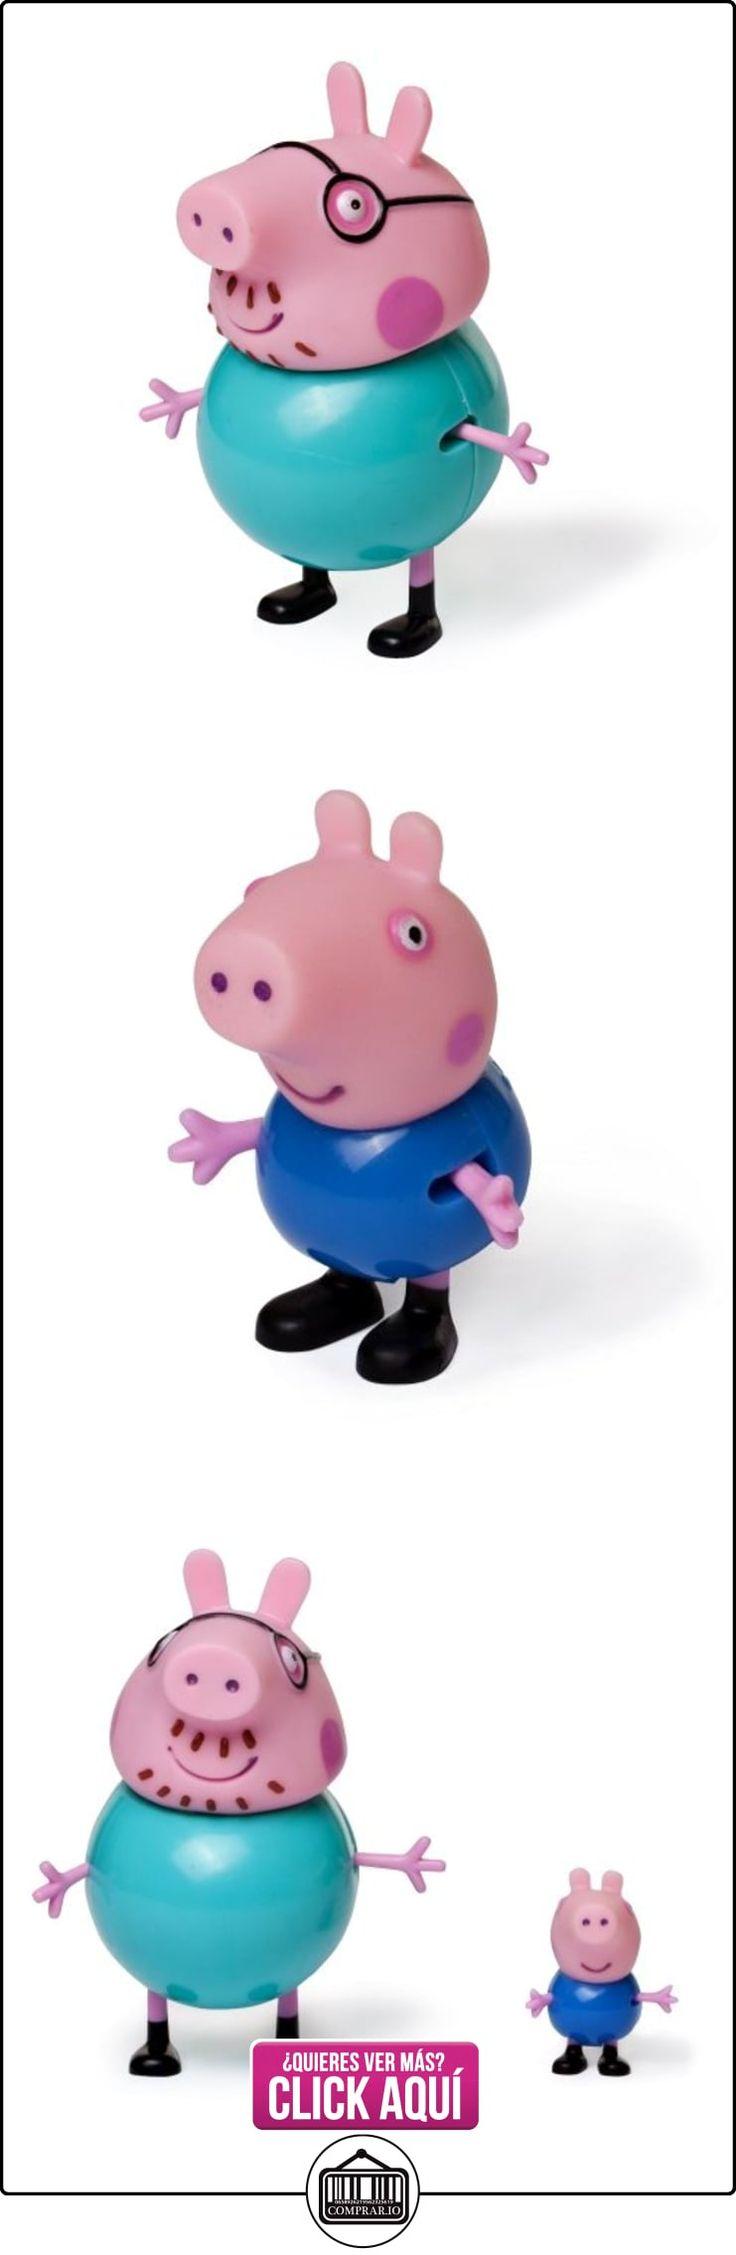 Peppa Pig - Papa Pig y George (personajes)  ✿ Peppa Pig - Peppa La Cerdita ✿ ▬► Ver oferta: http://comprar.io/goto/B00GYSNI92